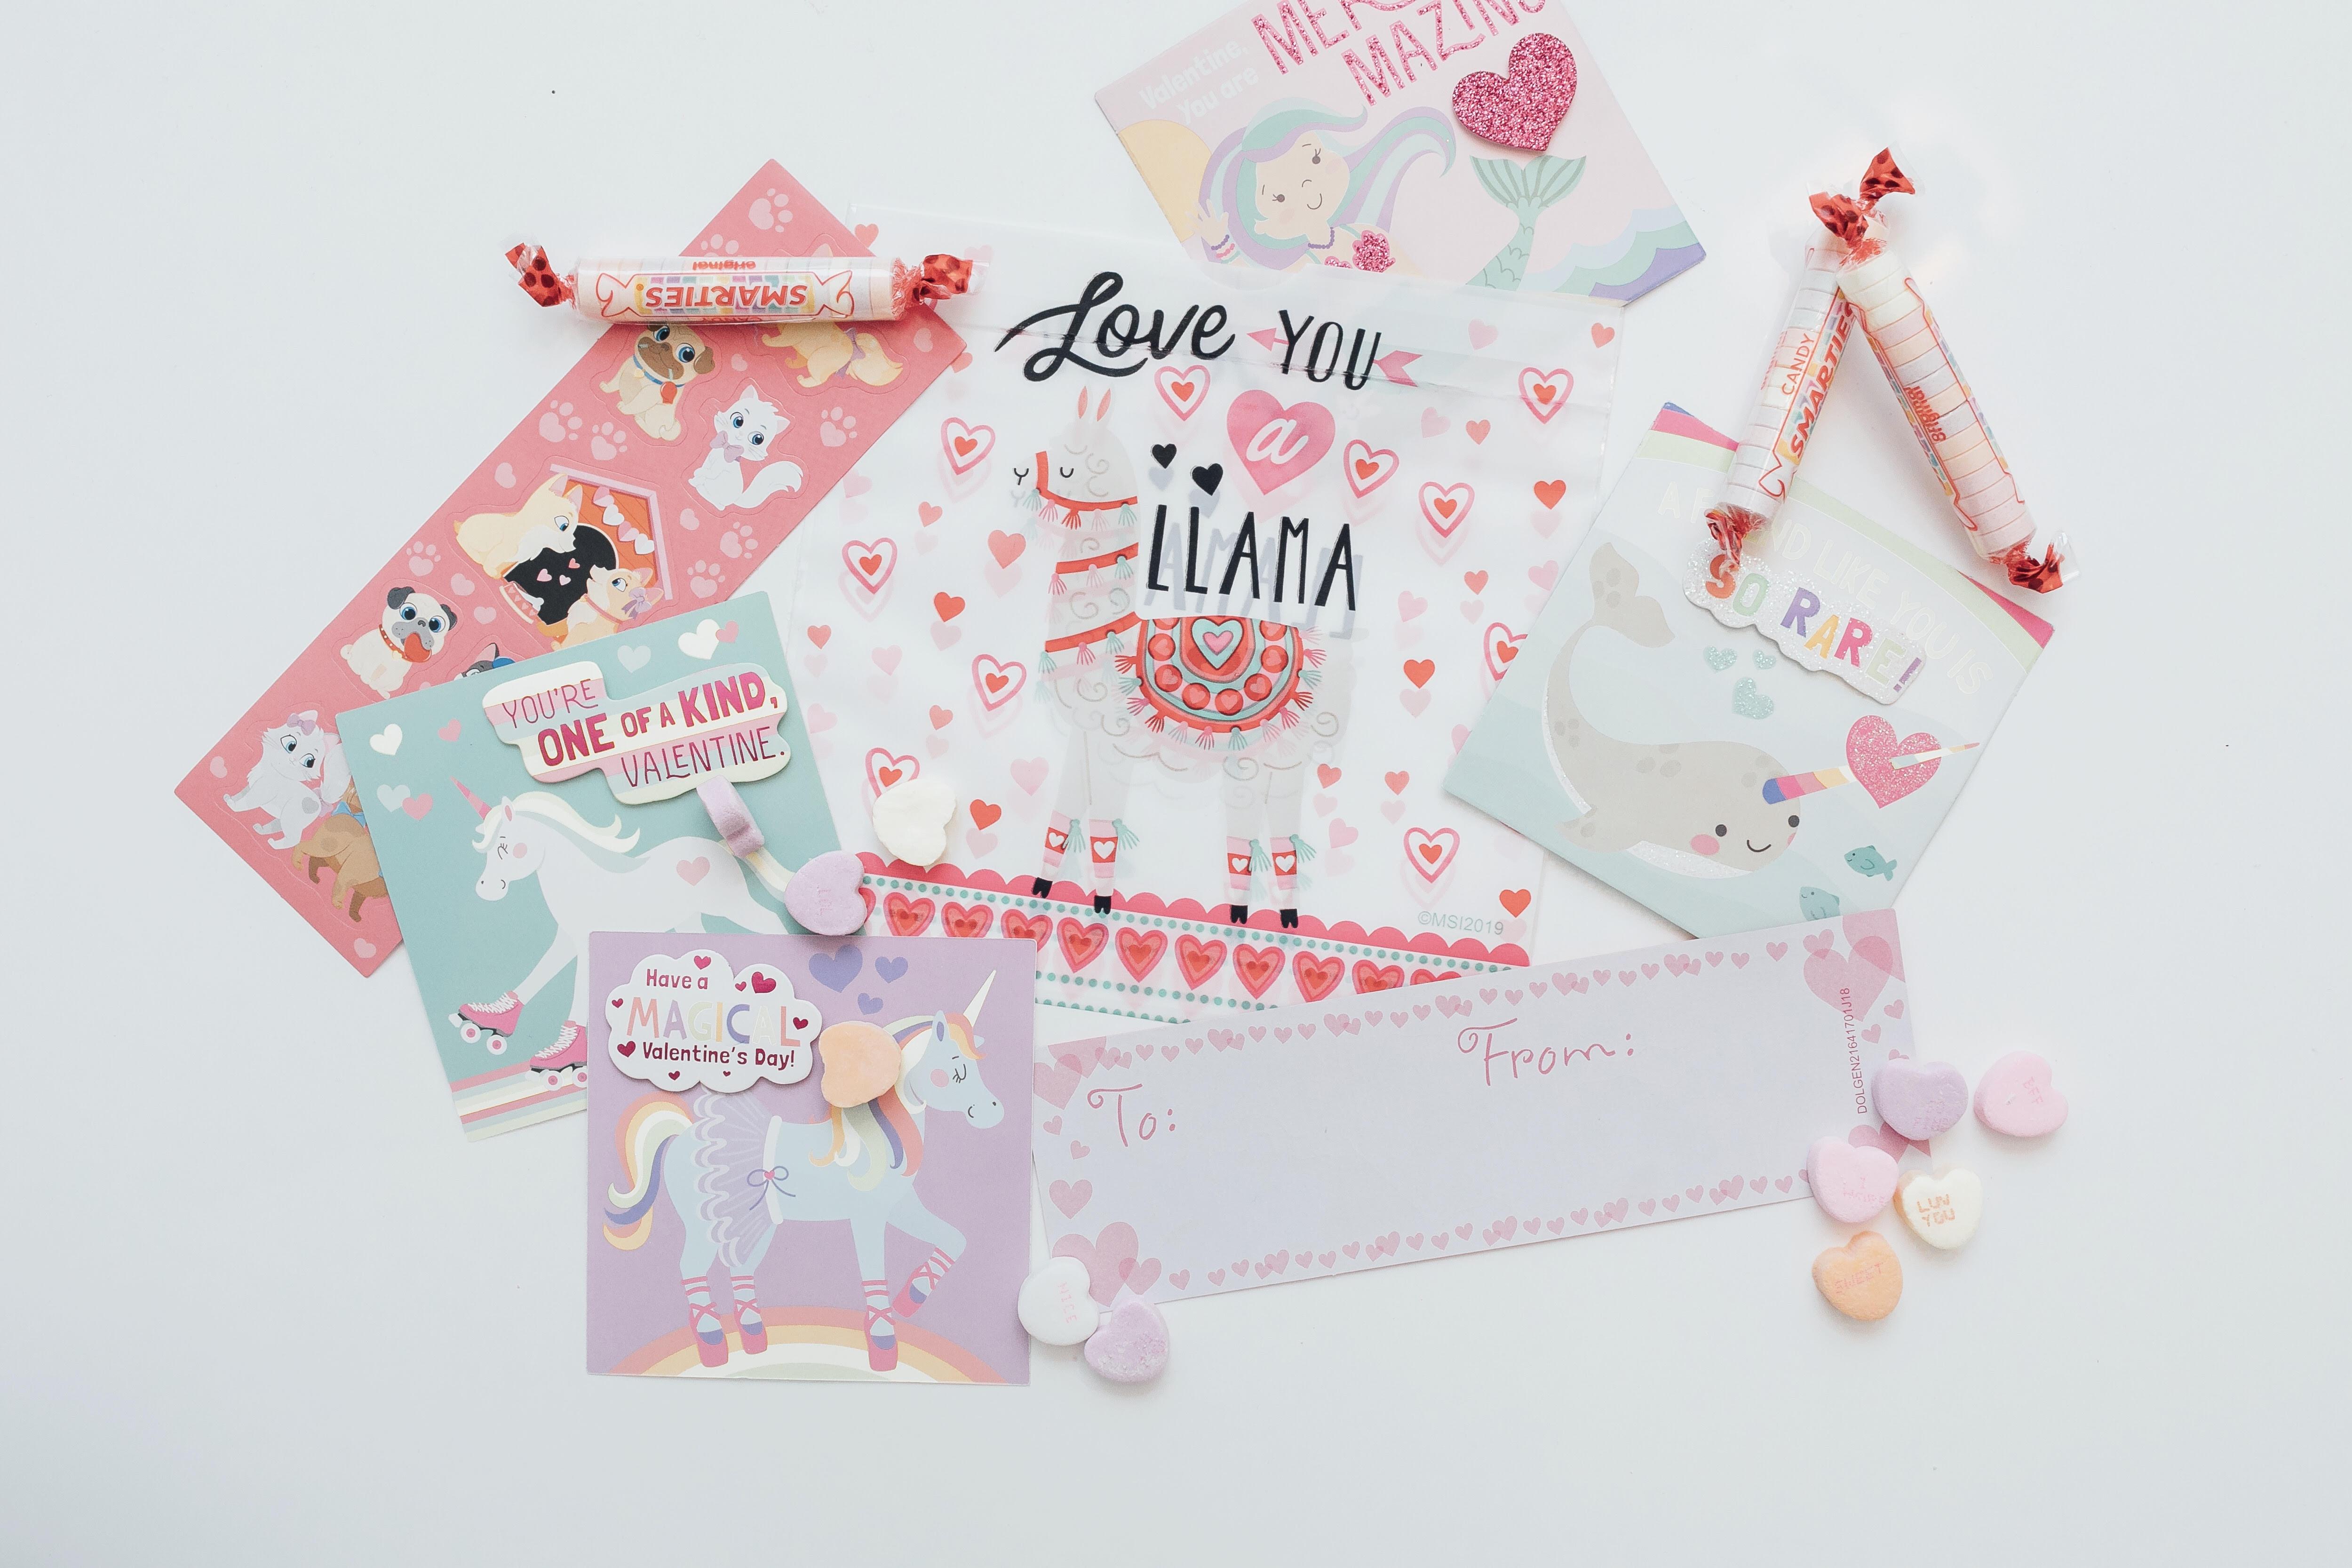 Cute Valentines Day Craft Ideas Walking In Memphis In High Heels